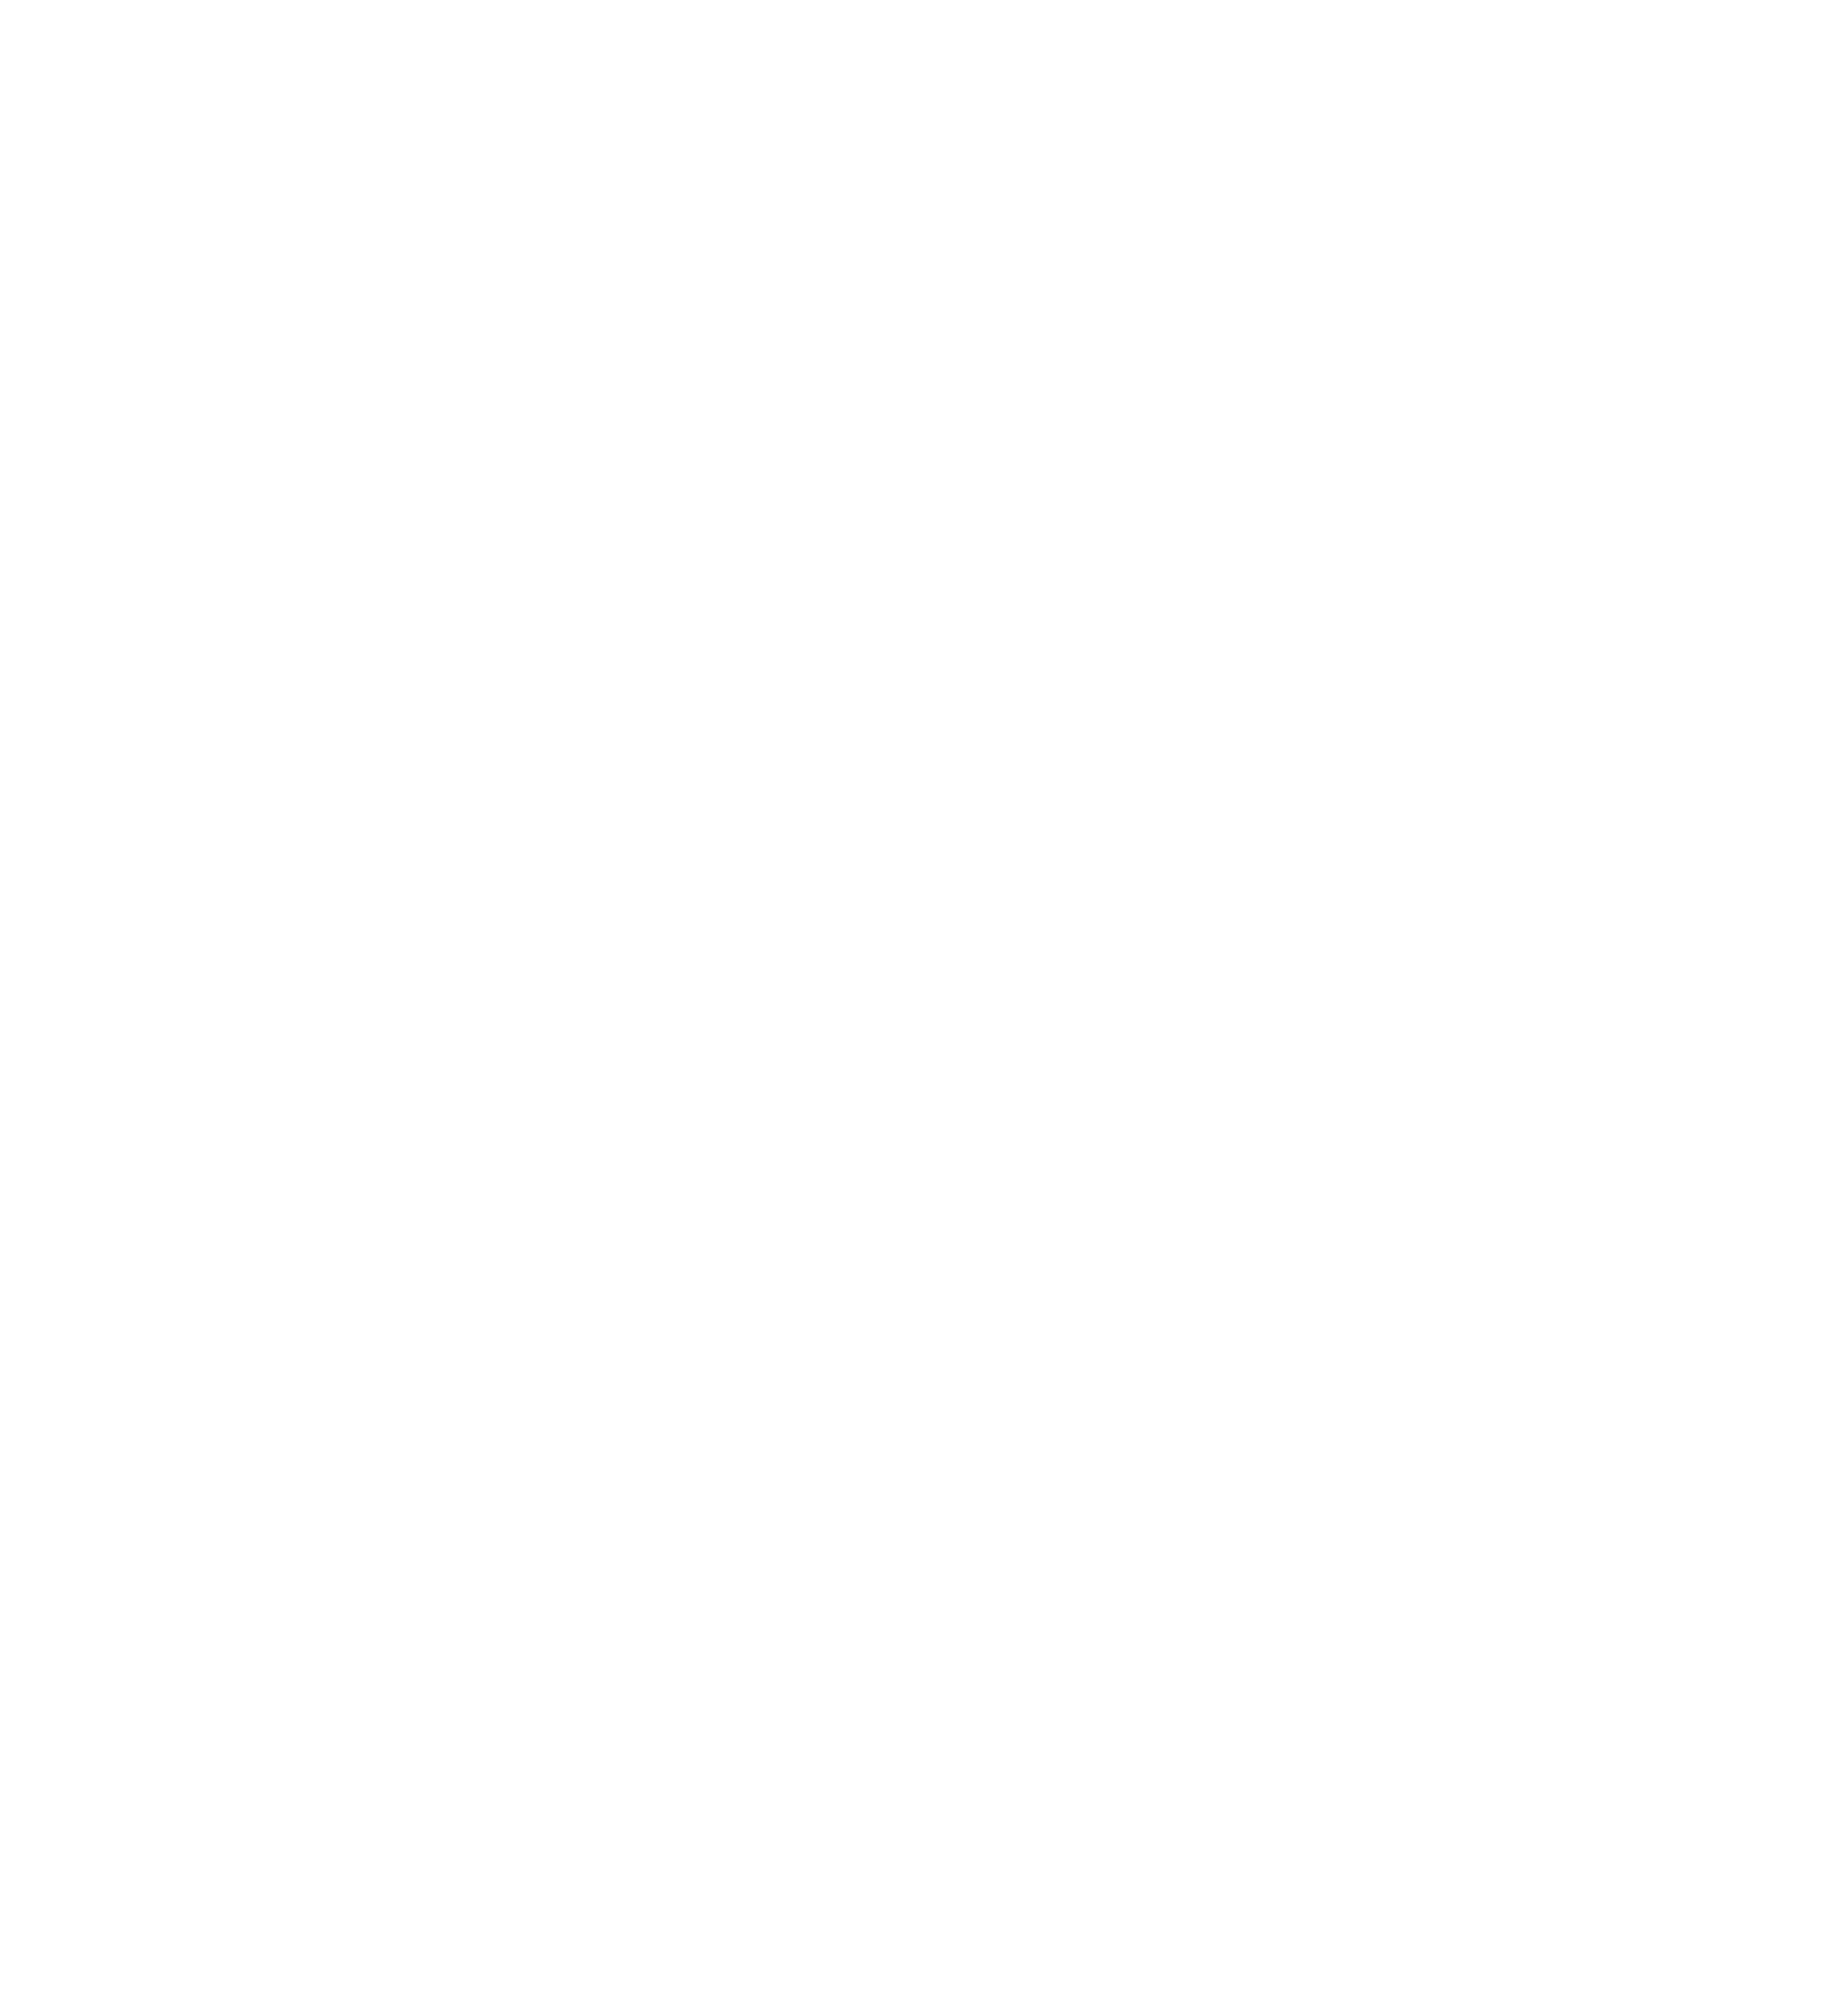 577d2135e3f0f32215813bc6_Africa universelle kondensatpumpe von refco refco condensate pump wiring diagram at soozxer.org